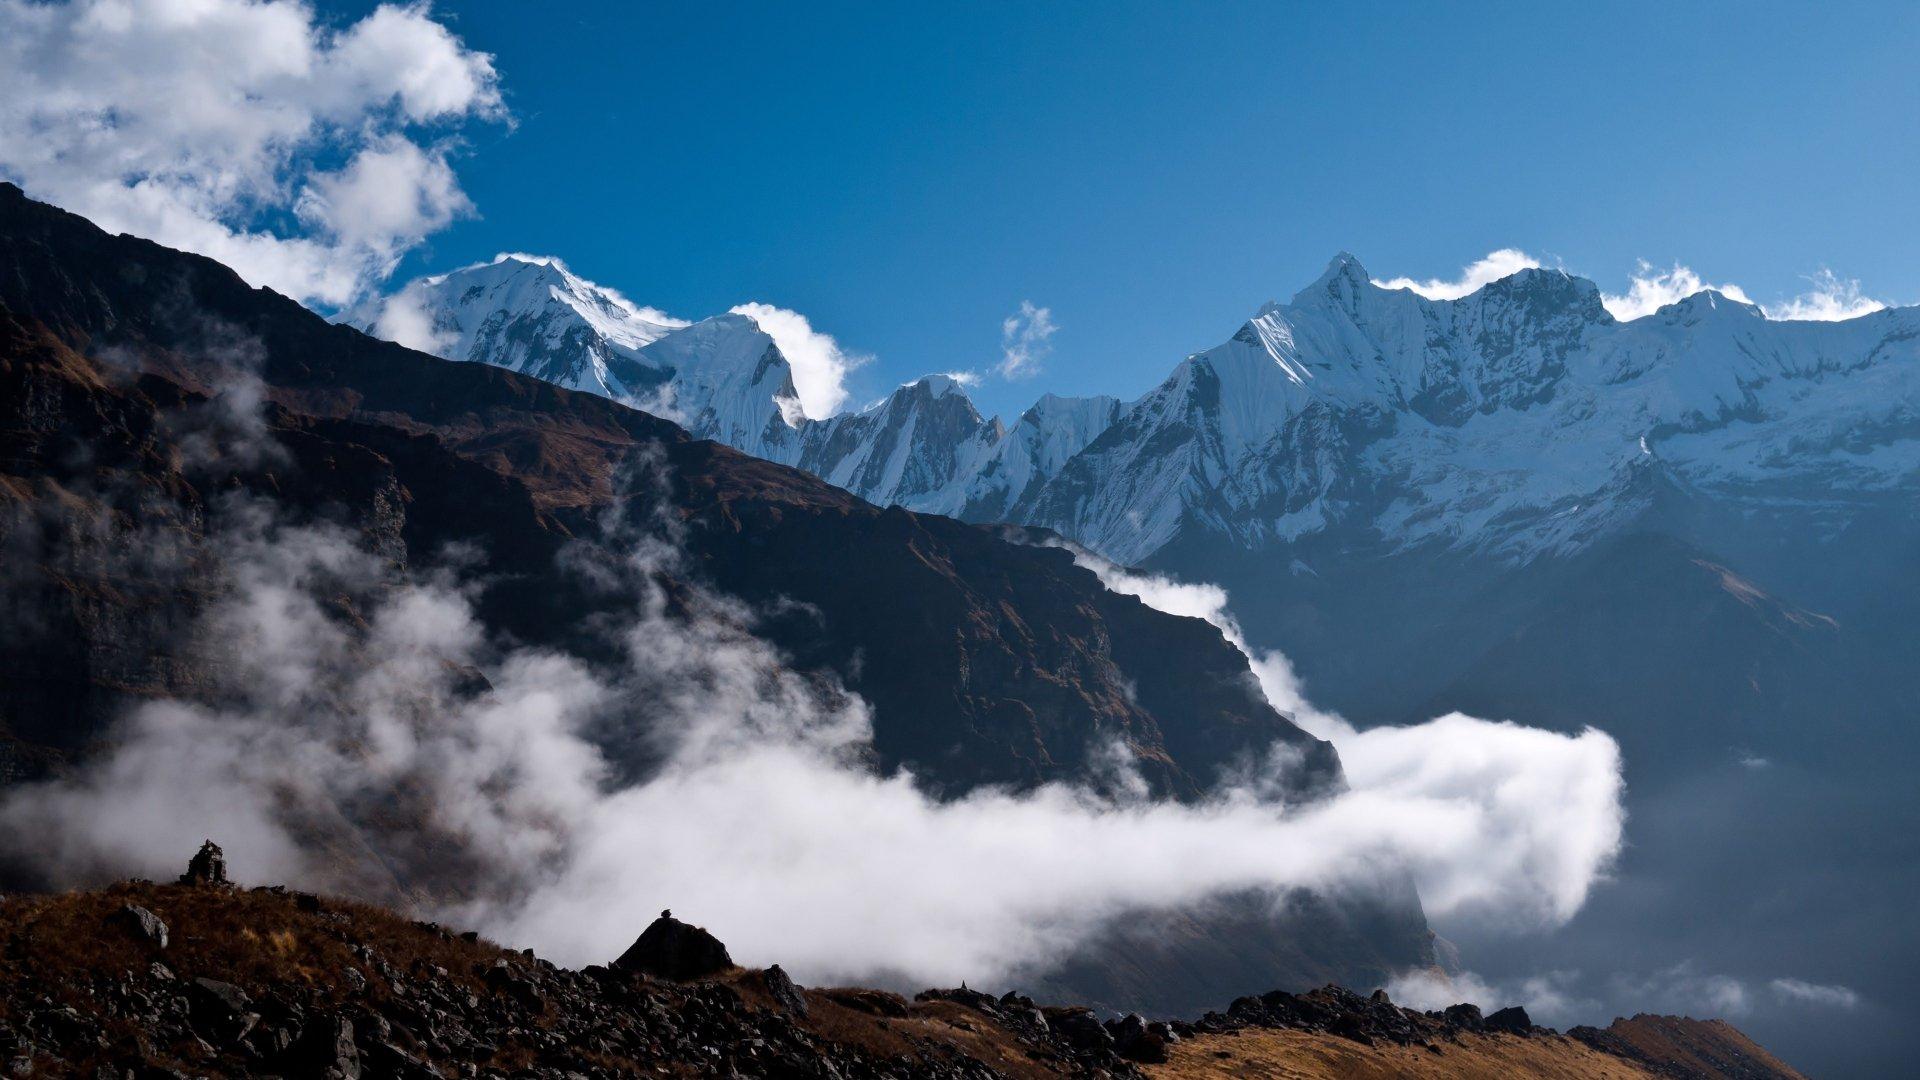 Montagne 4k Ultra Fond d'écran HD | Arrière-Plan | 3840x2160 | ID:467185 - Wallpaper Abyss